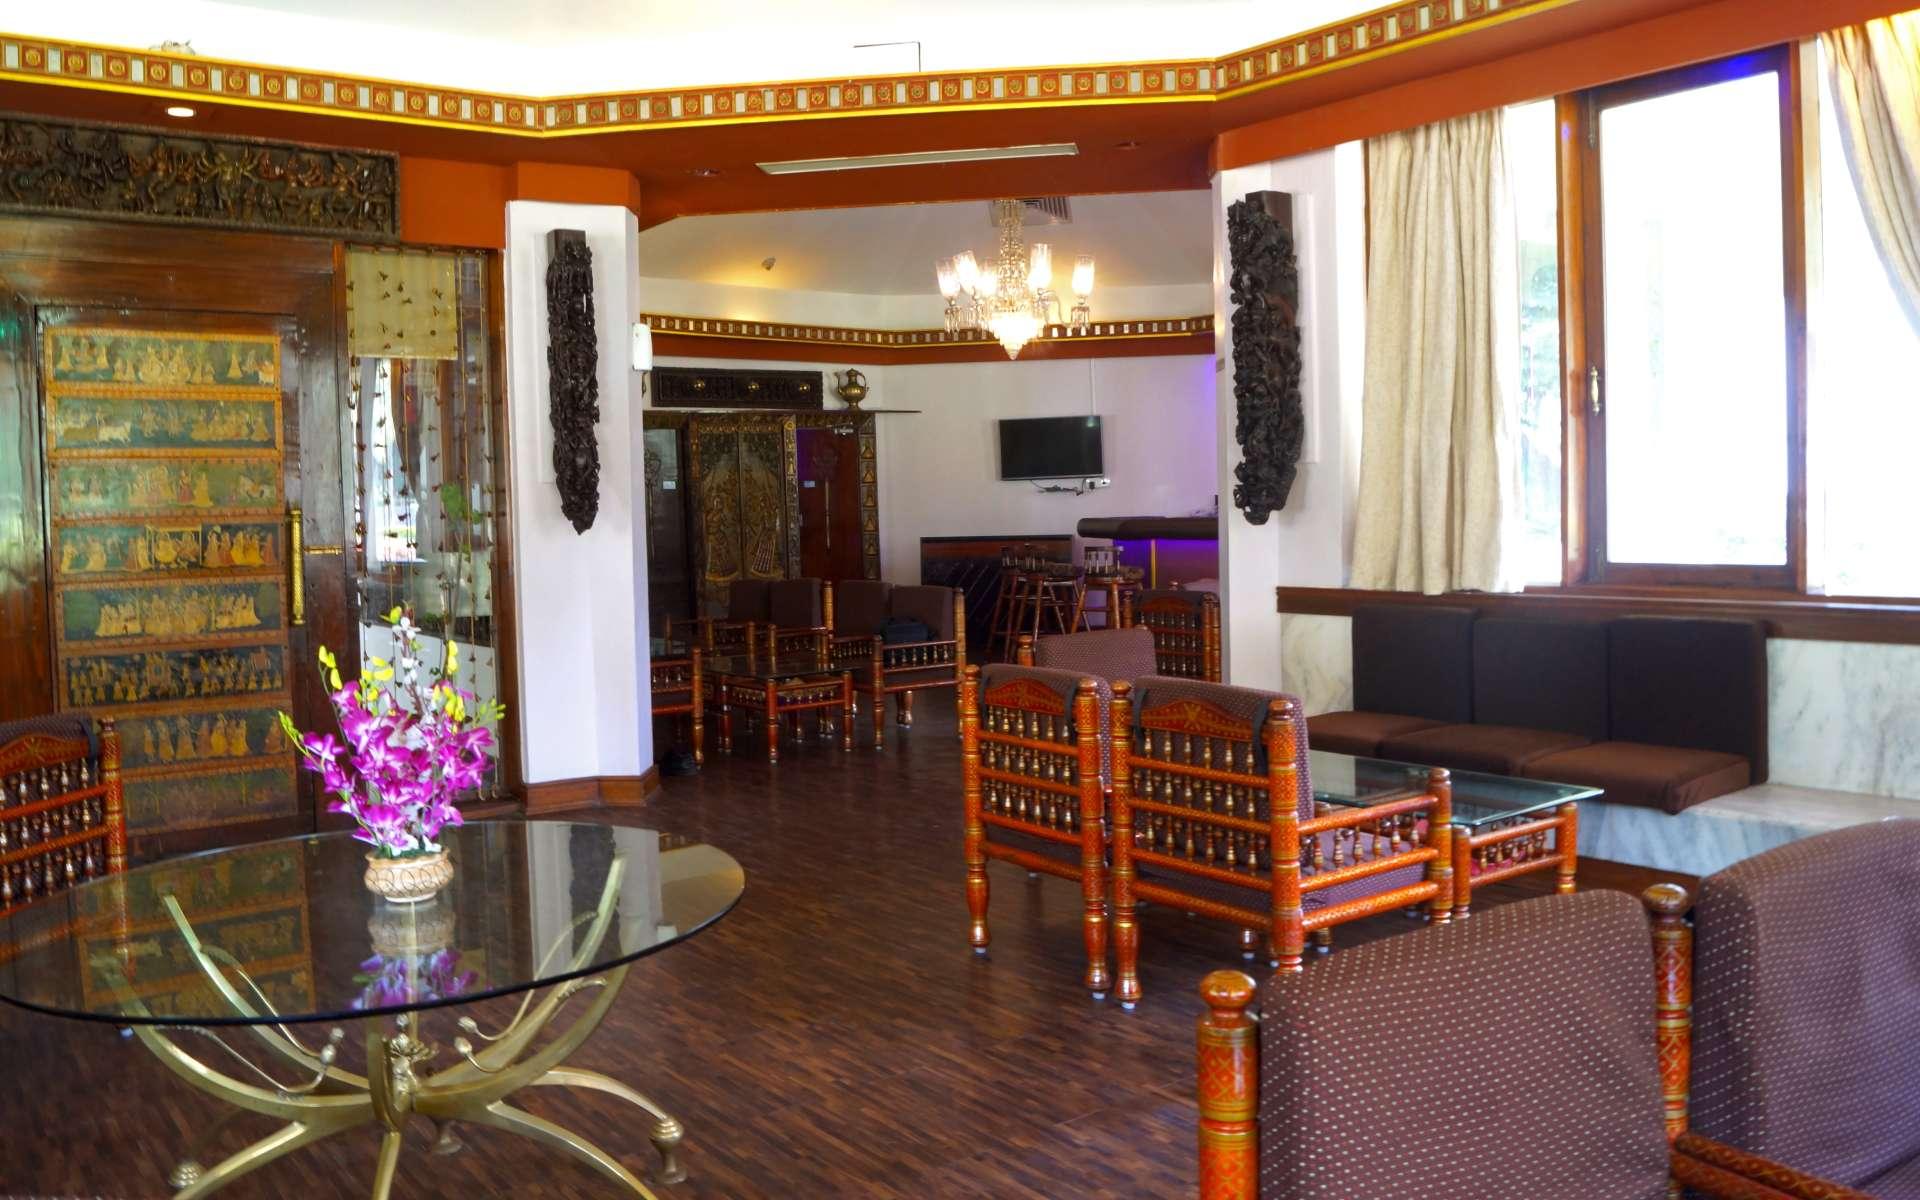 garbah Restaurant Ambassador Ajanta Aurangabad Dining - The Ambassador | Heritage Hotels in Mumbai, Aurangabad, Chennai - Dining